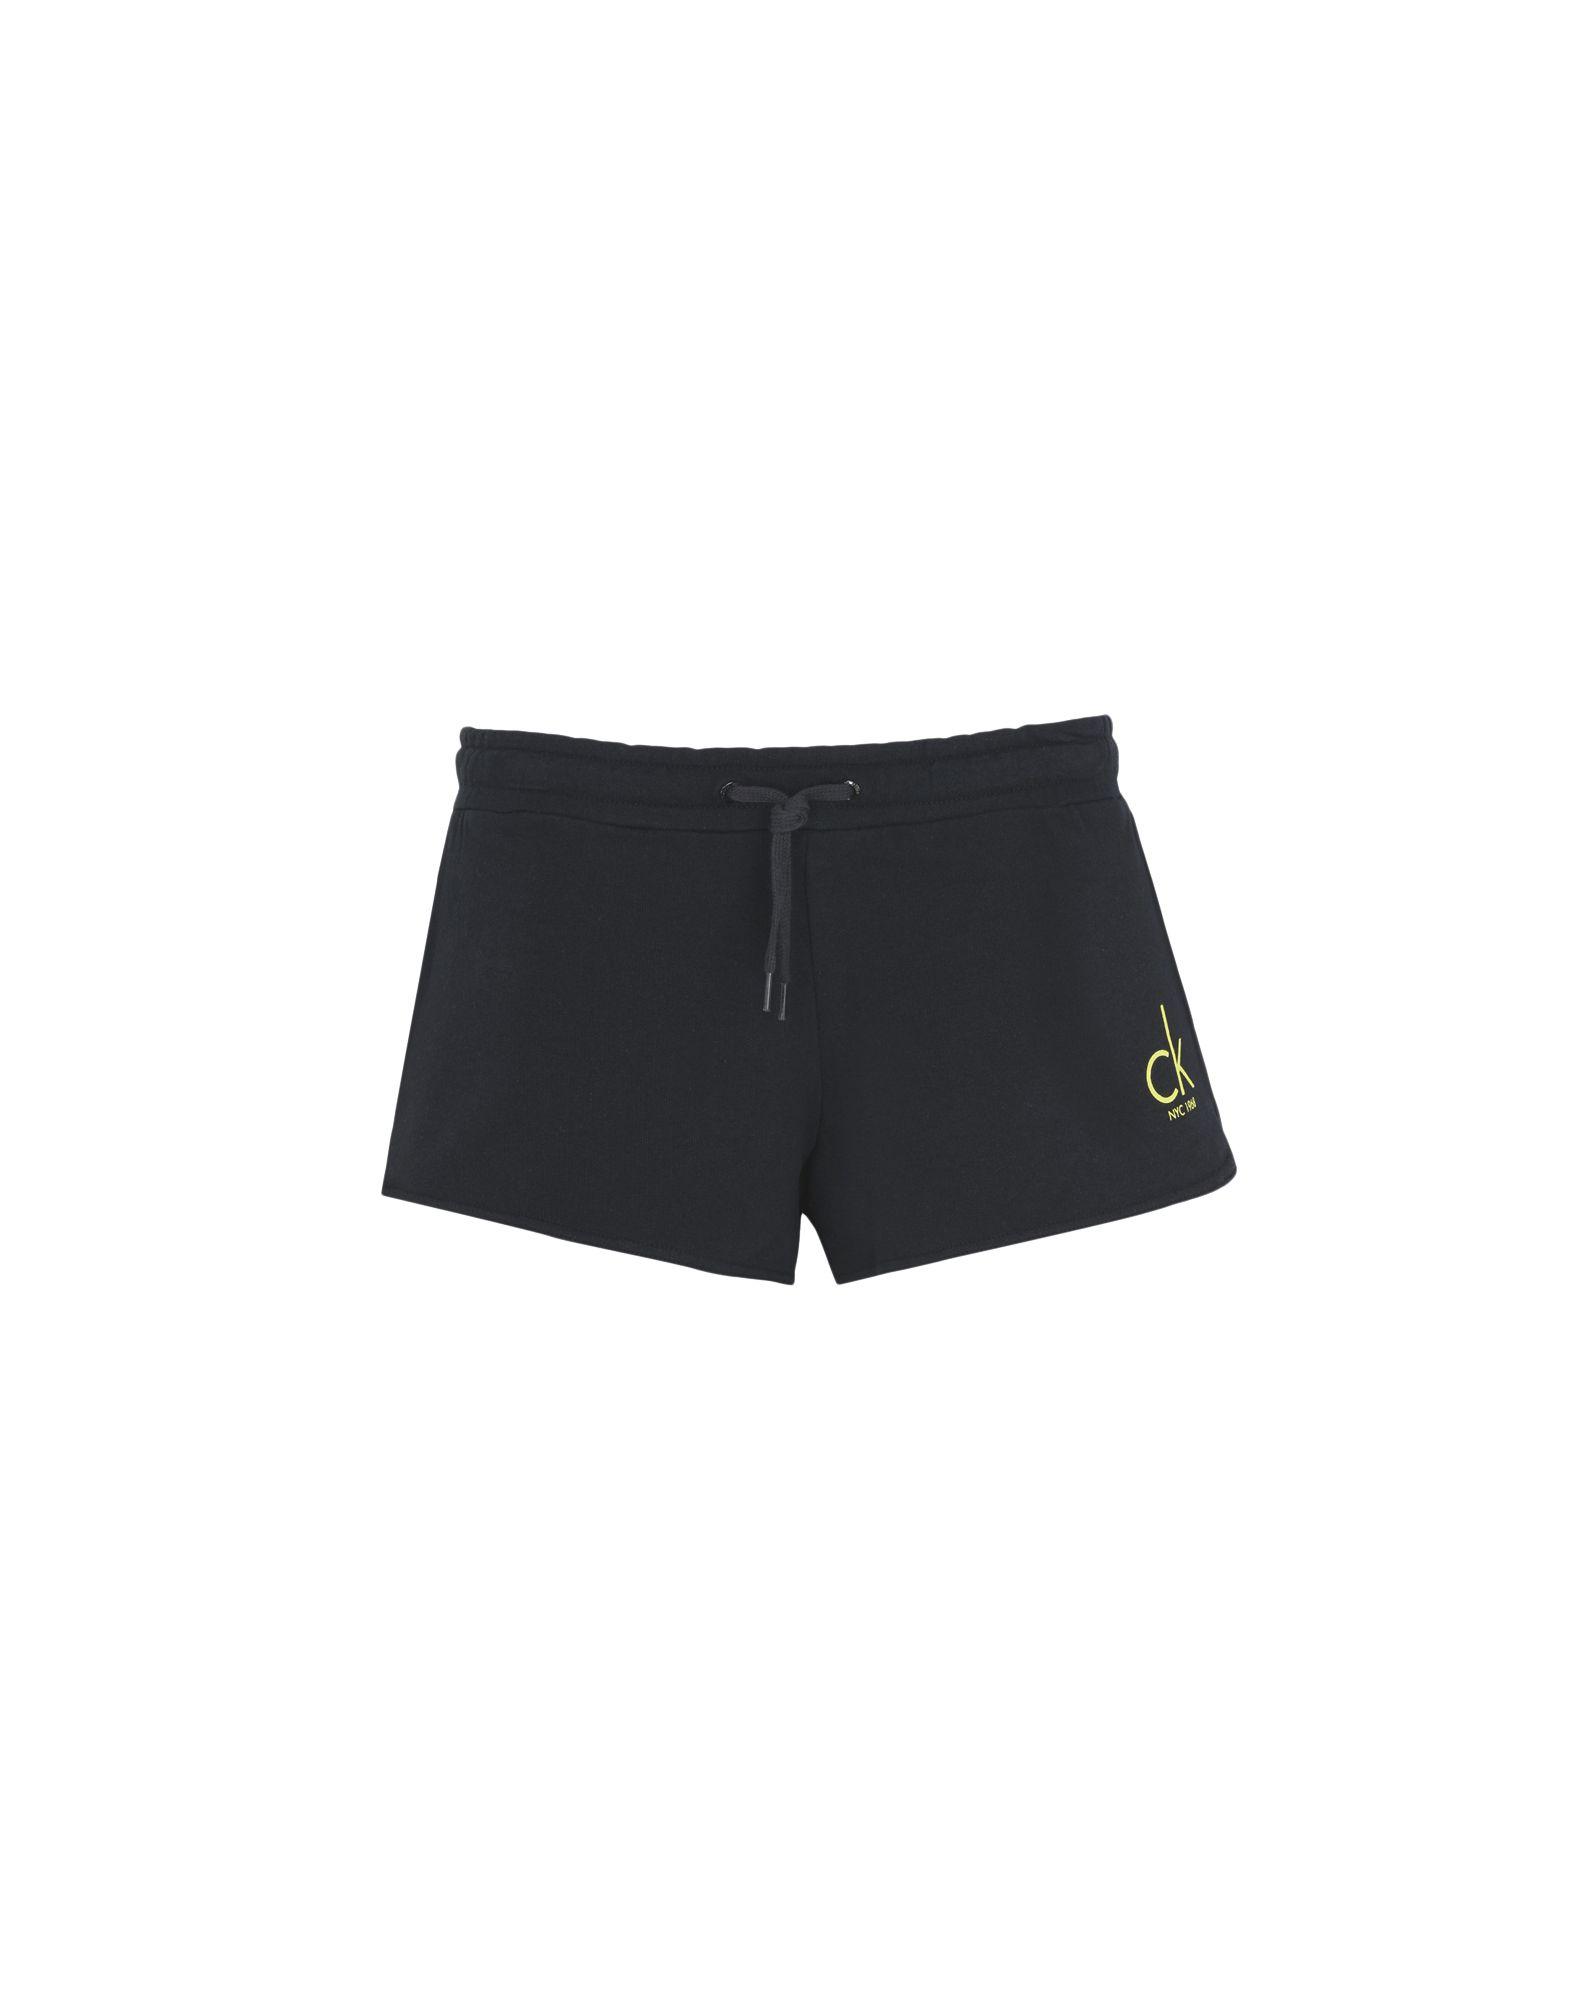 CALVIN KLEIN Пляжные брюки и шорты мужские пляжные шорты menstore surf s001